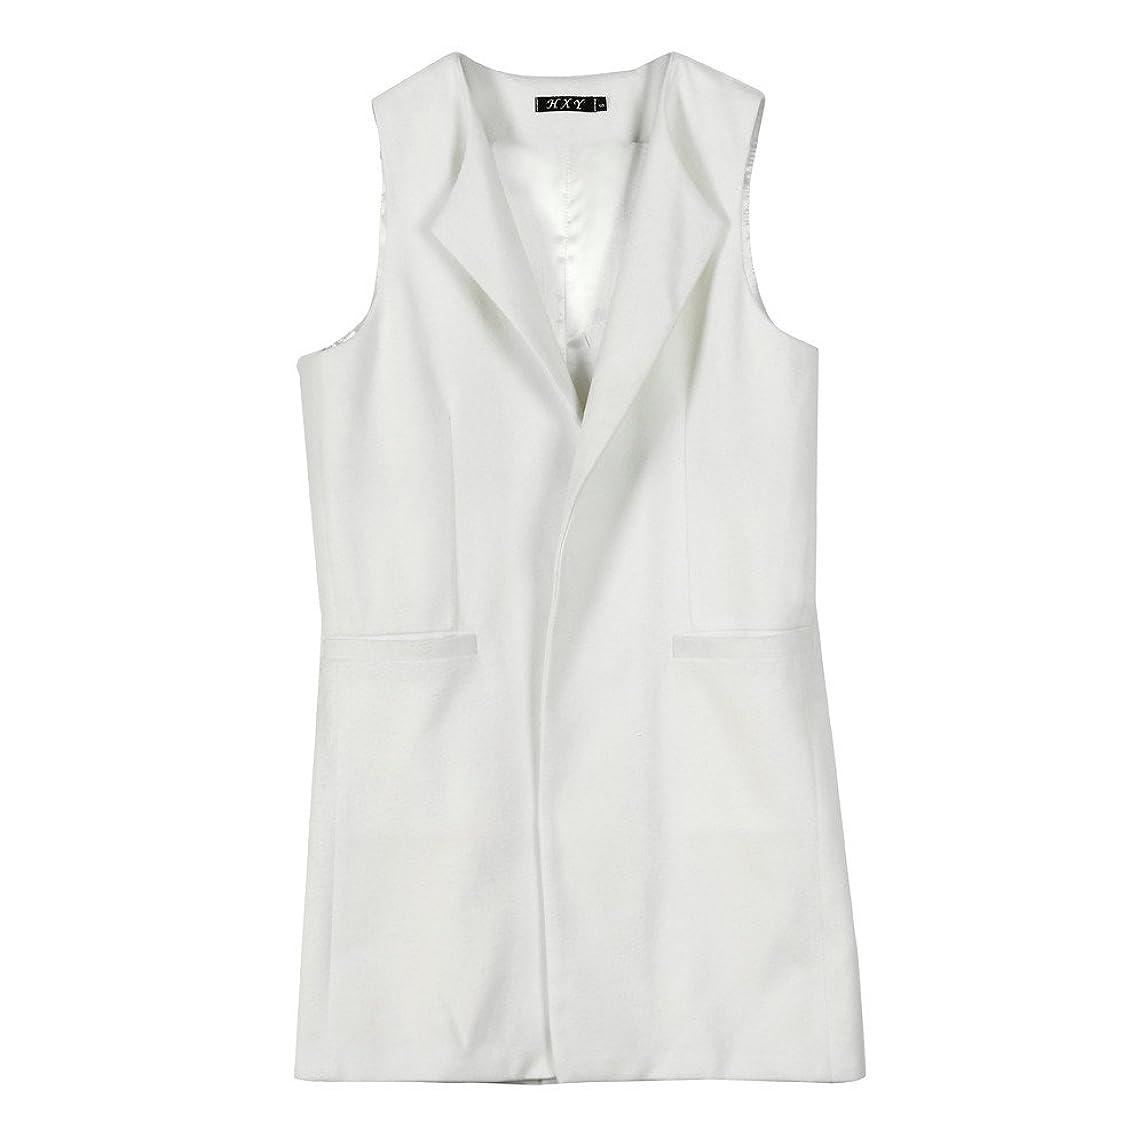 Toimoth Womens Solid Sleeveless Long Waistcoat Vest Gilet Jacket Coat Parka Outwear Cardigan with Pocket